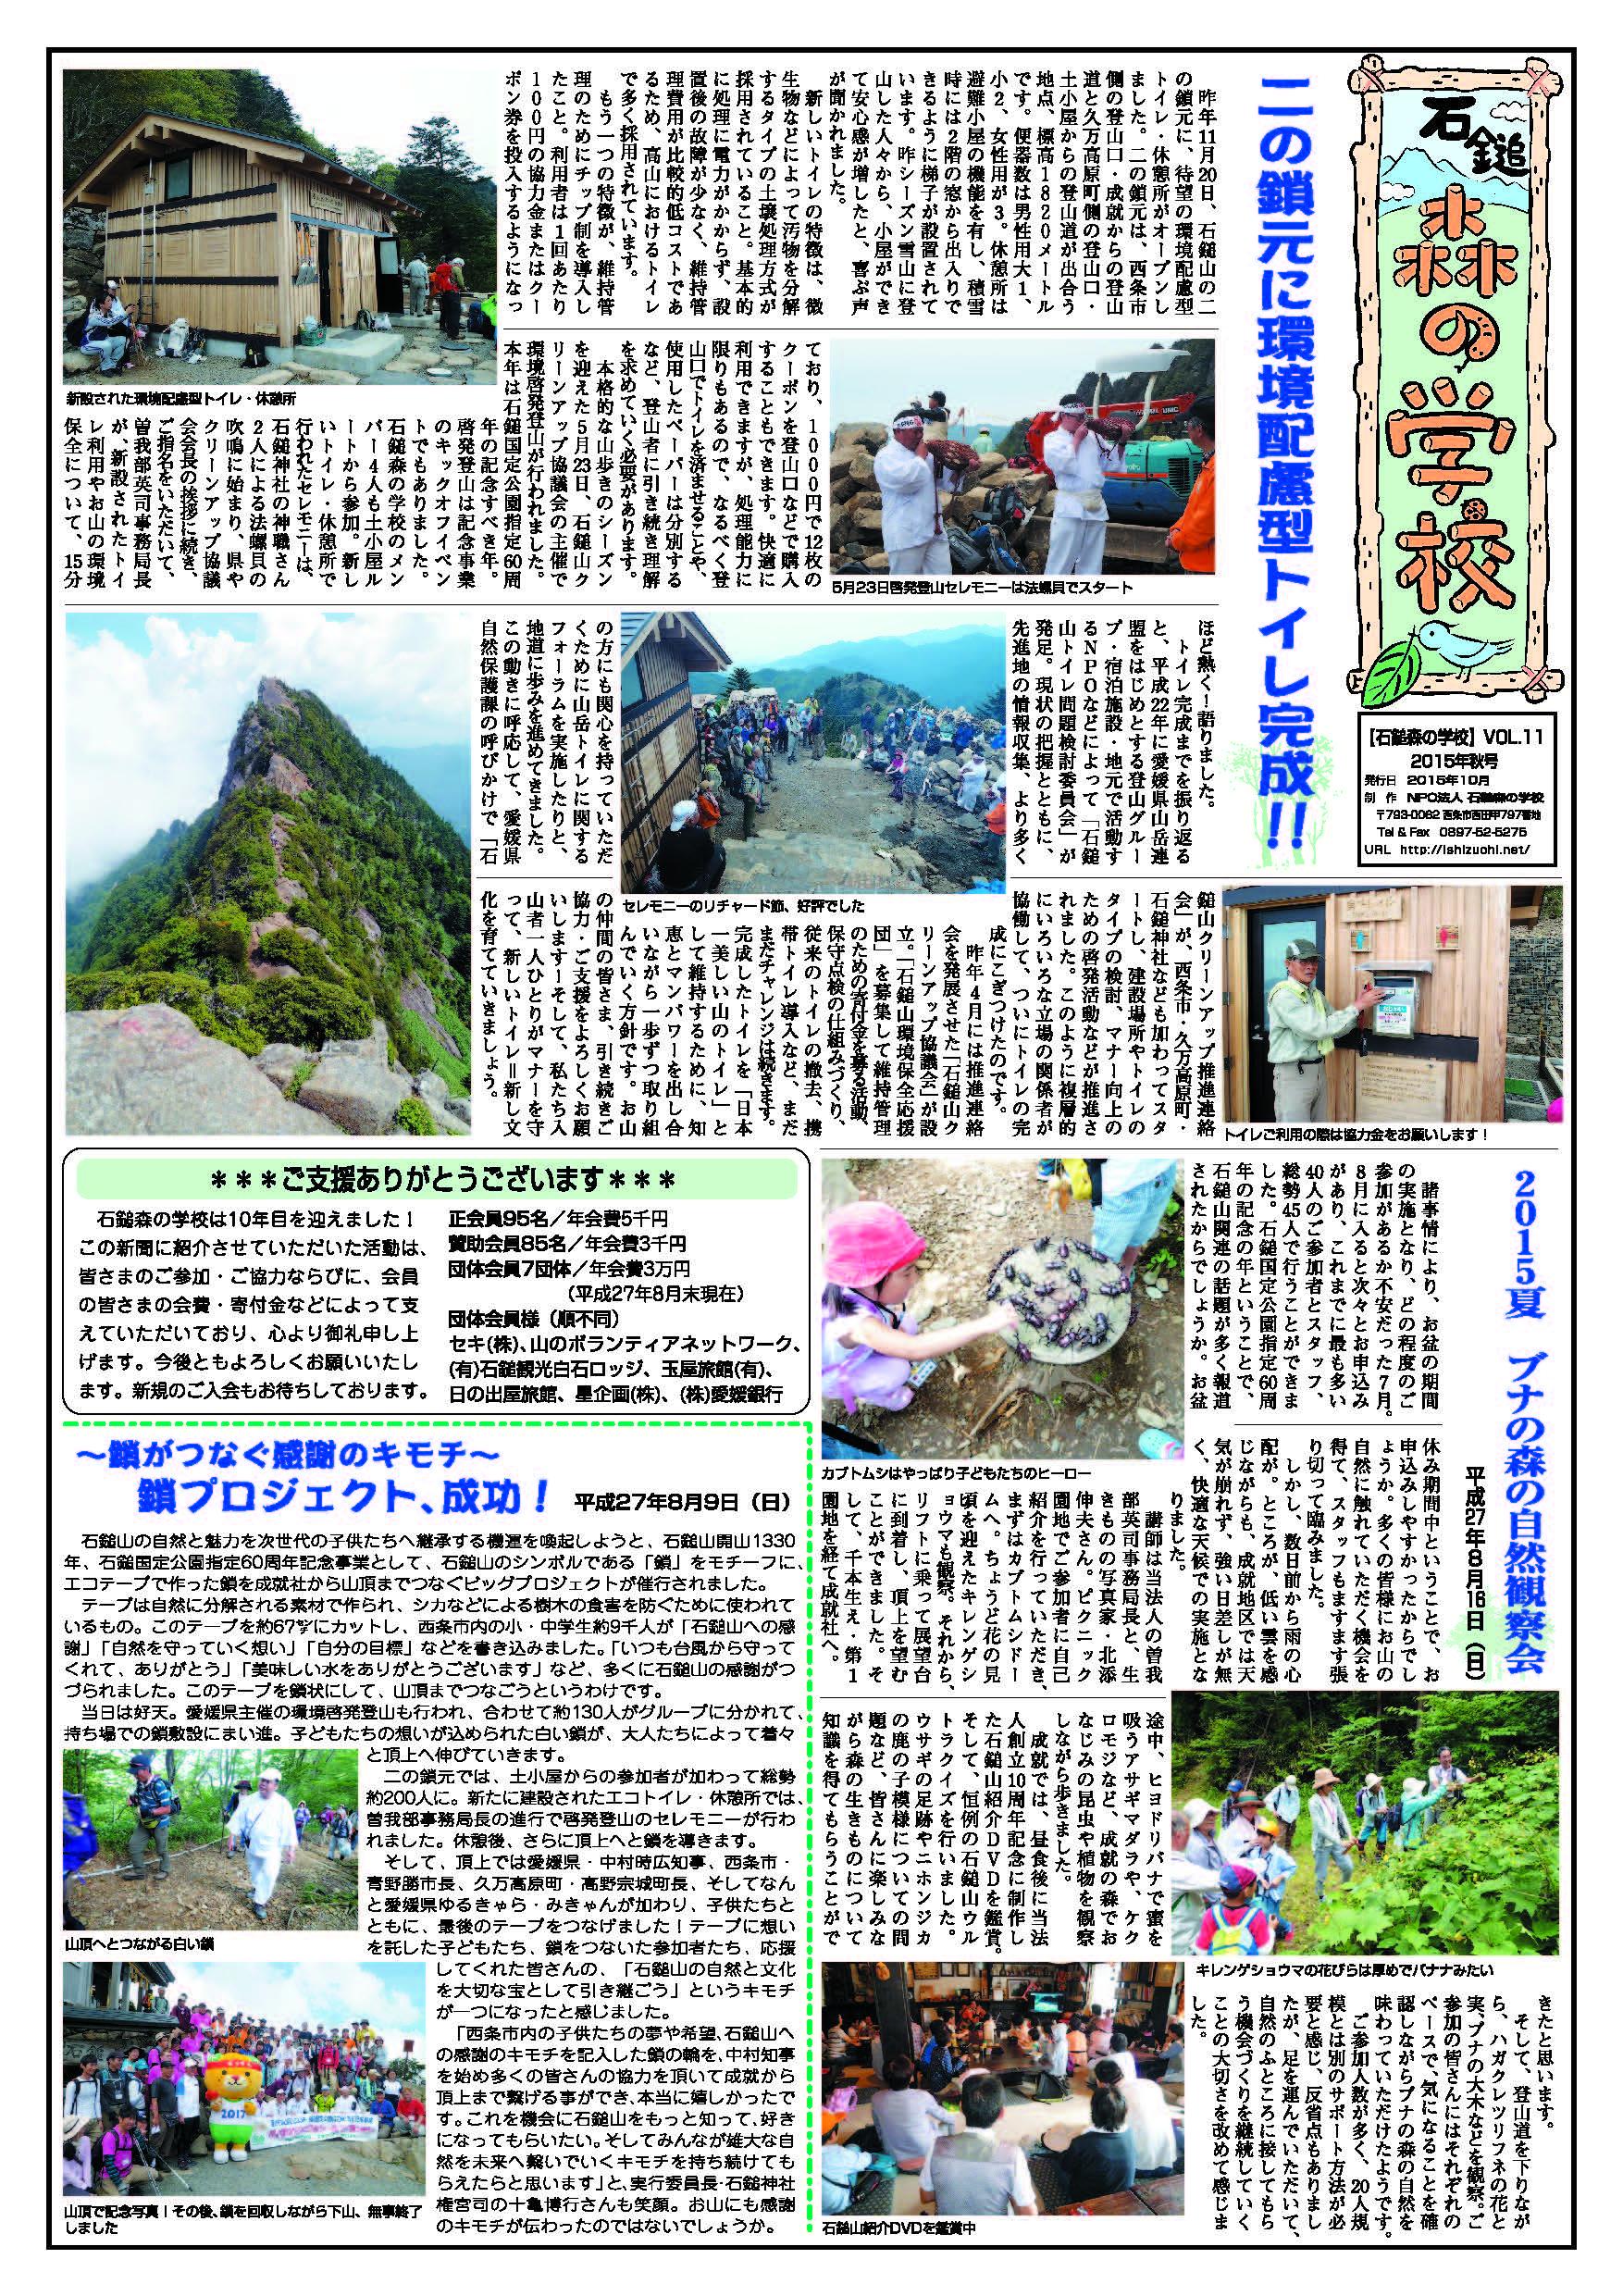 2014年石鎚森の学校新聞